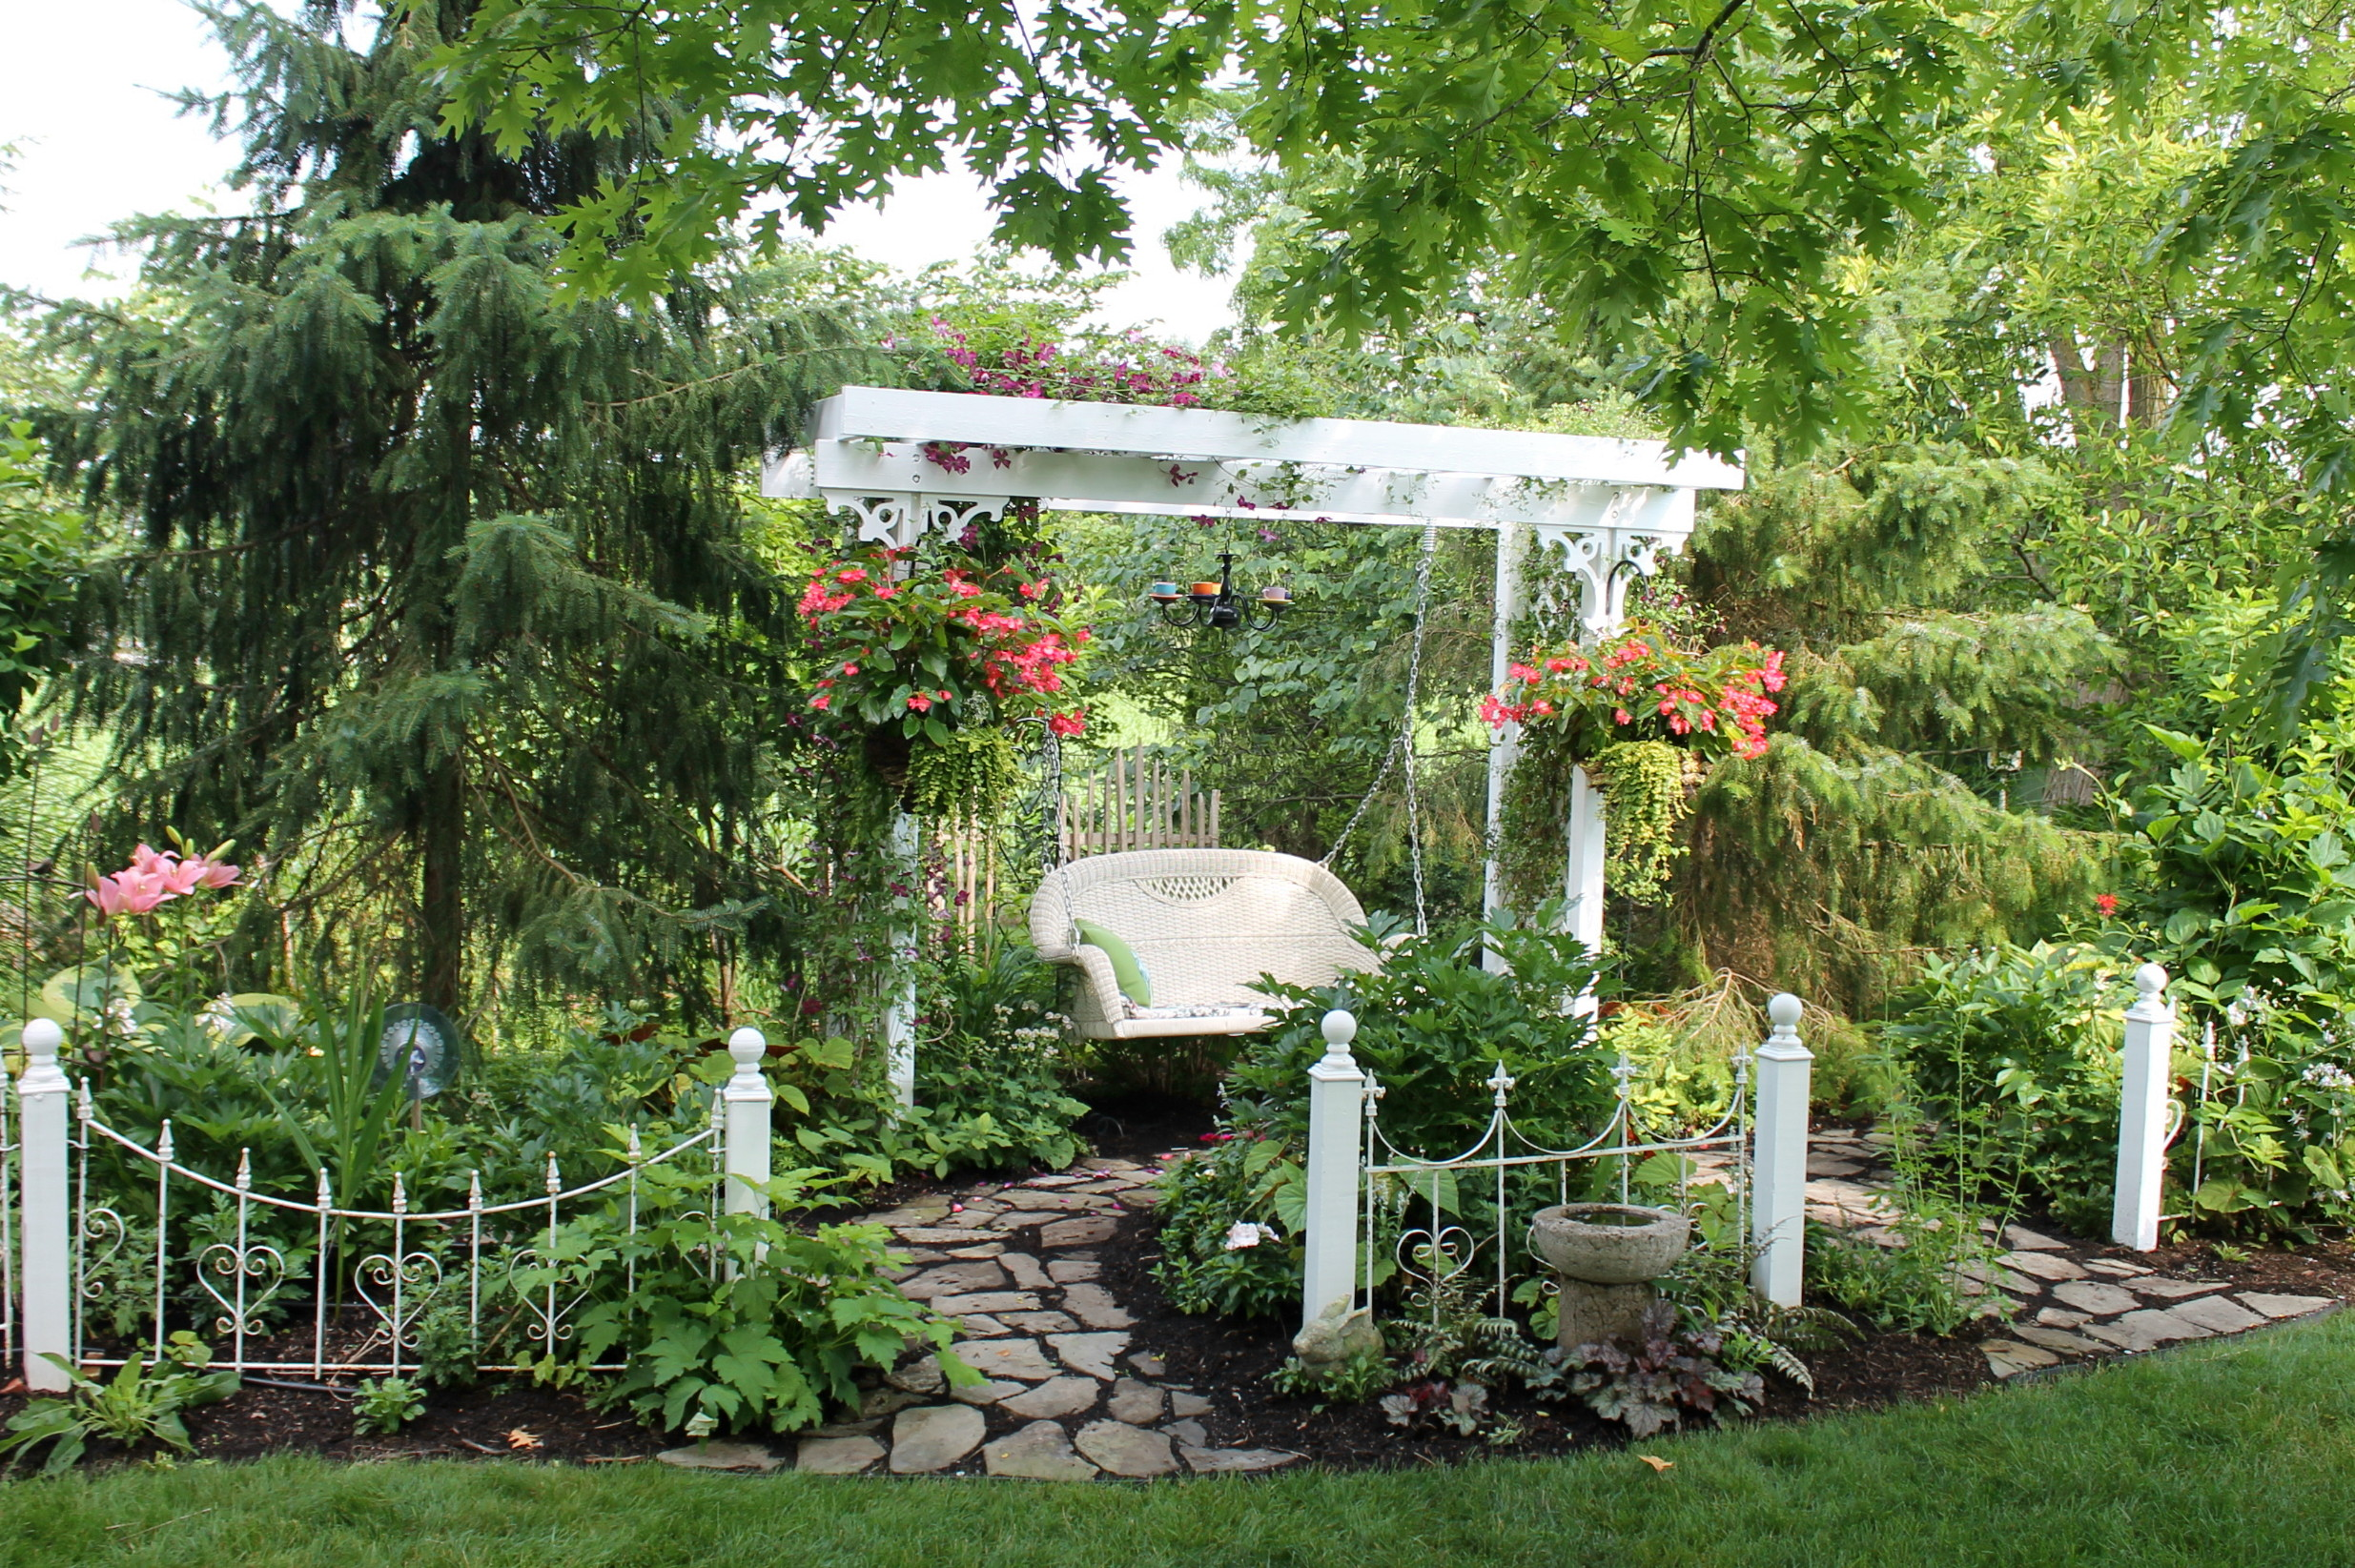 The Engles Backyard Swing